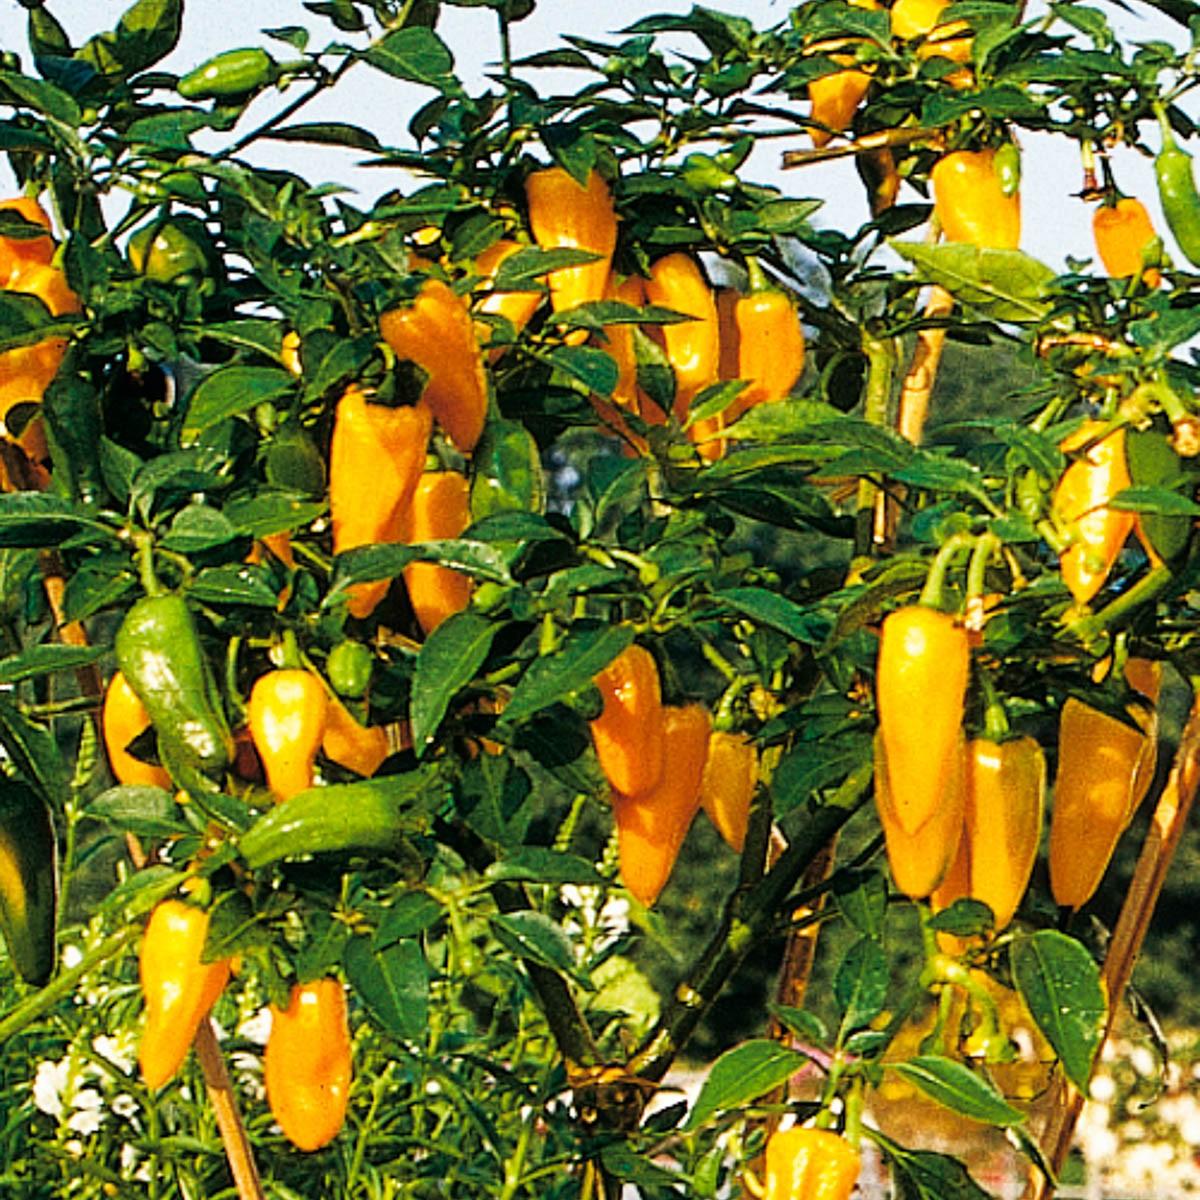 Topf-Peperoni 'Cheyenne' scharf und aromatsich